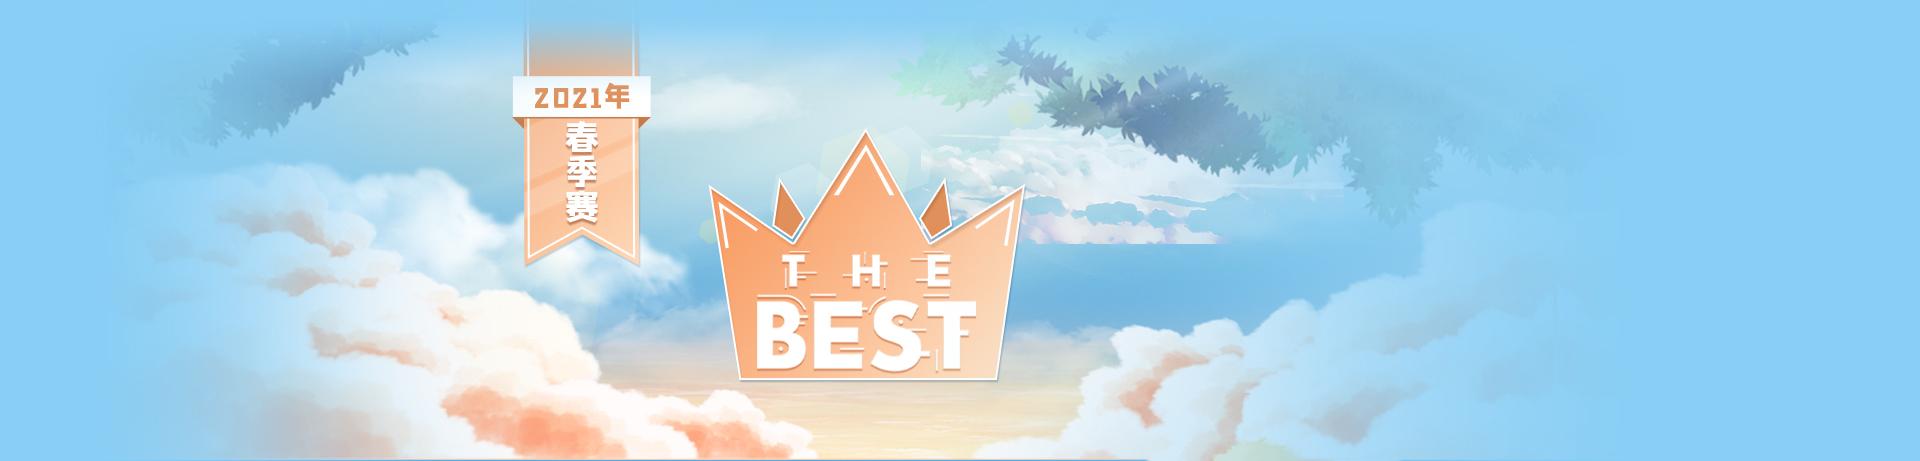 [活动]2021The Best